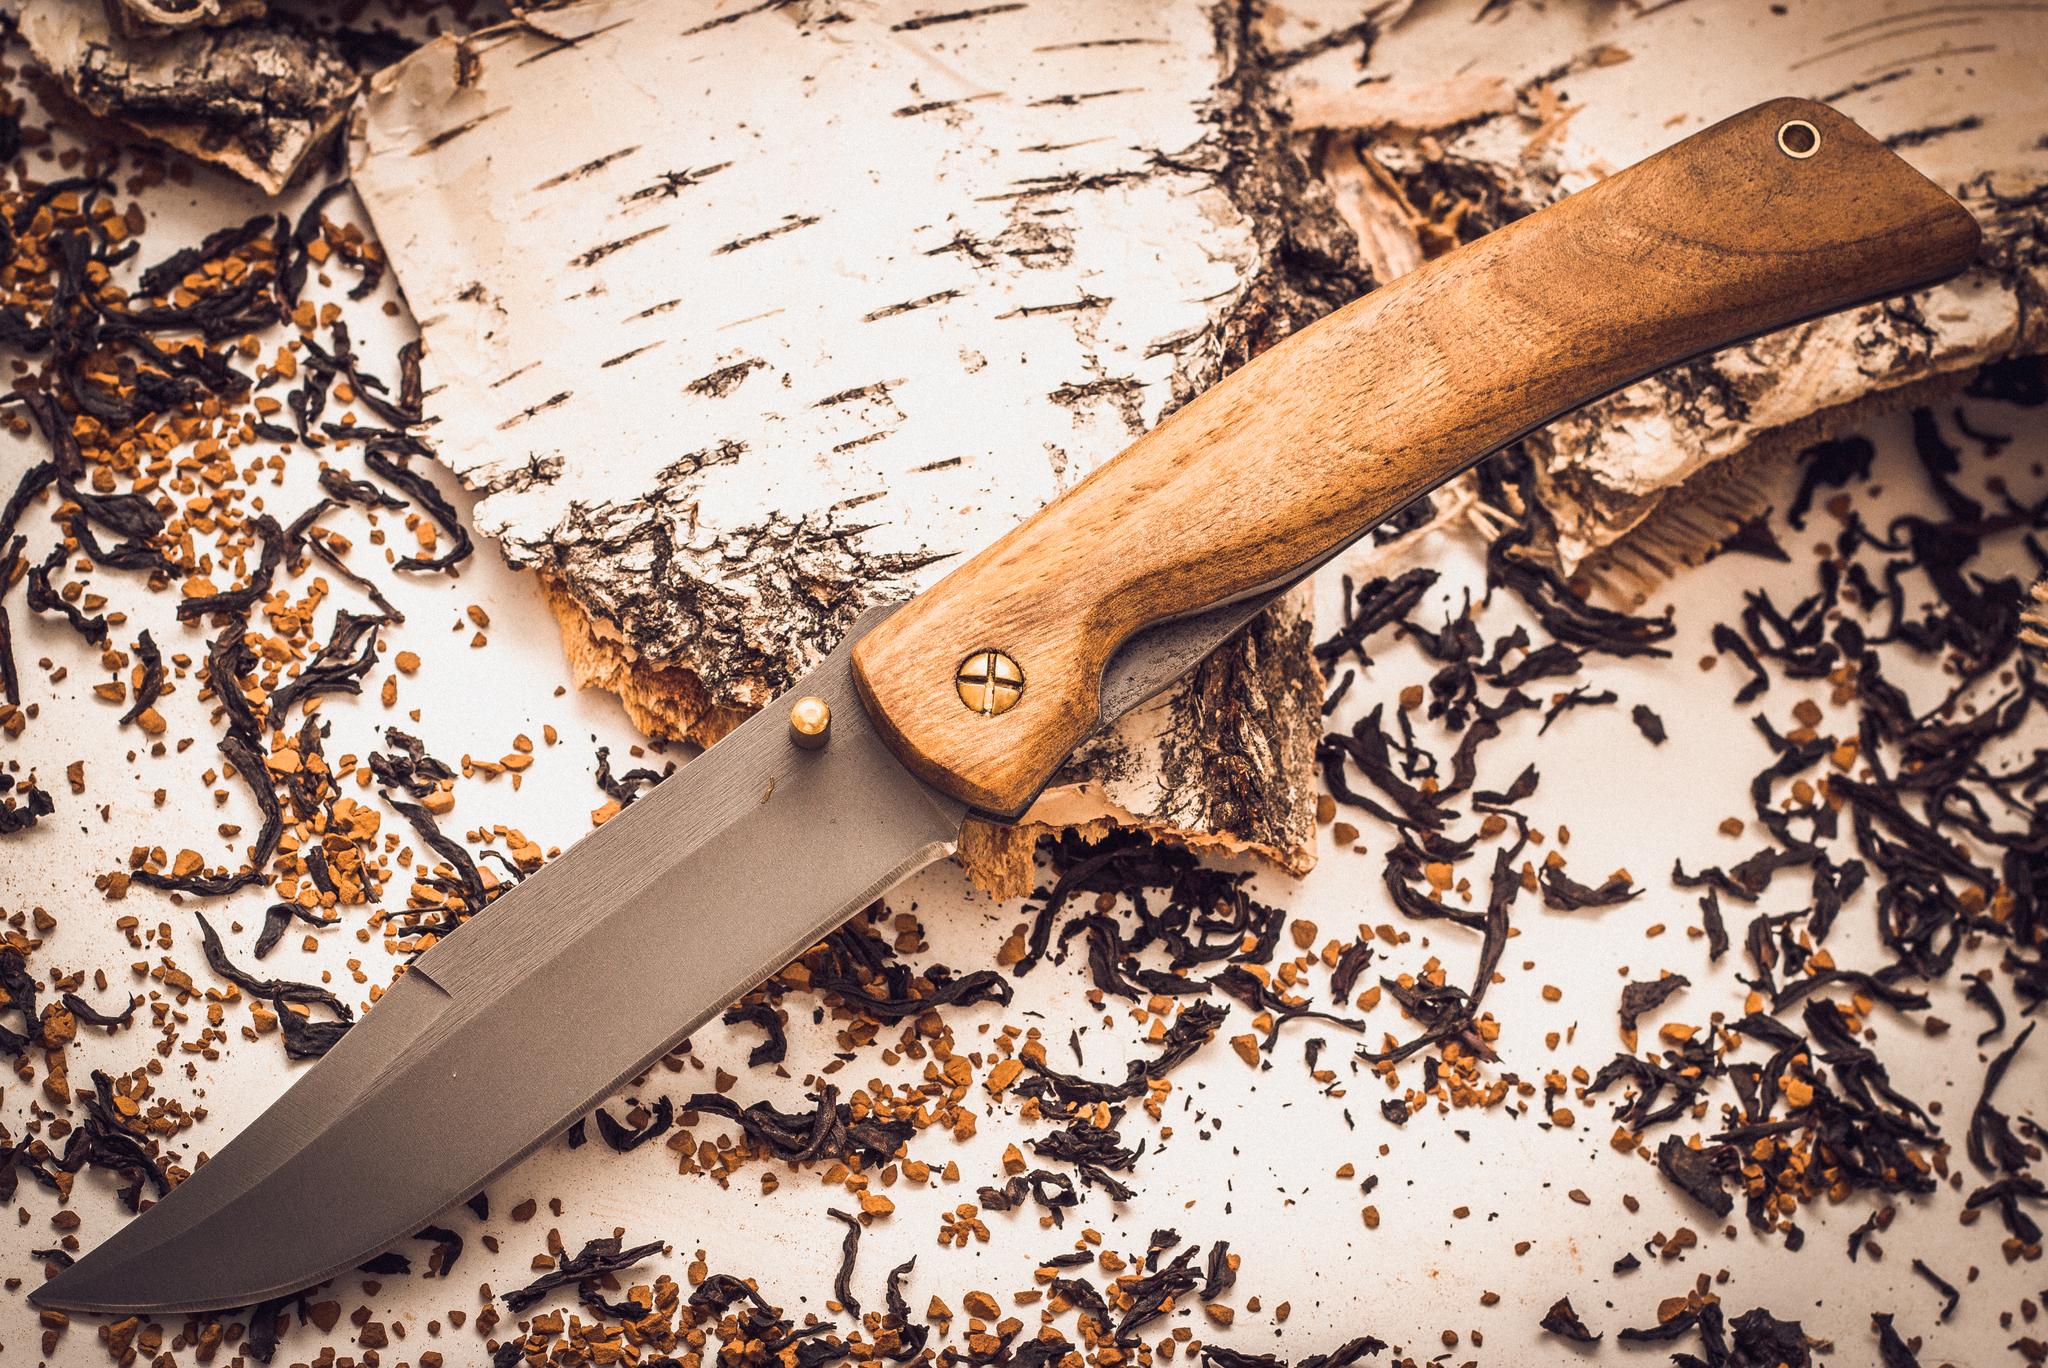 Складной нож Храбрец, сталь 95х18, орех от Марычев